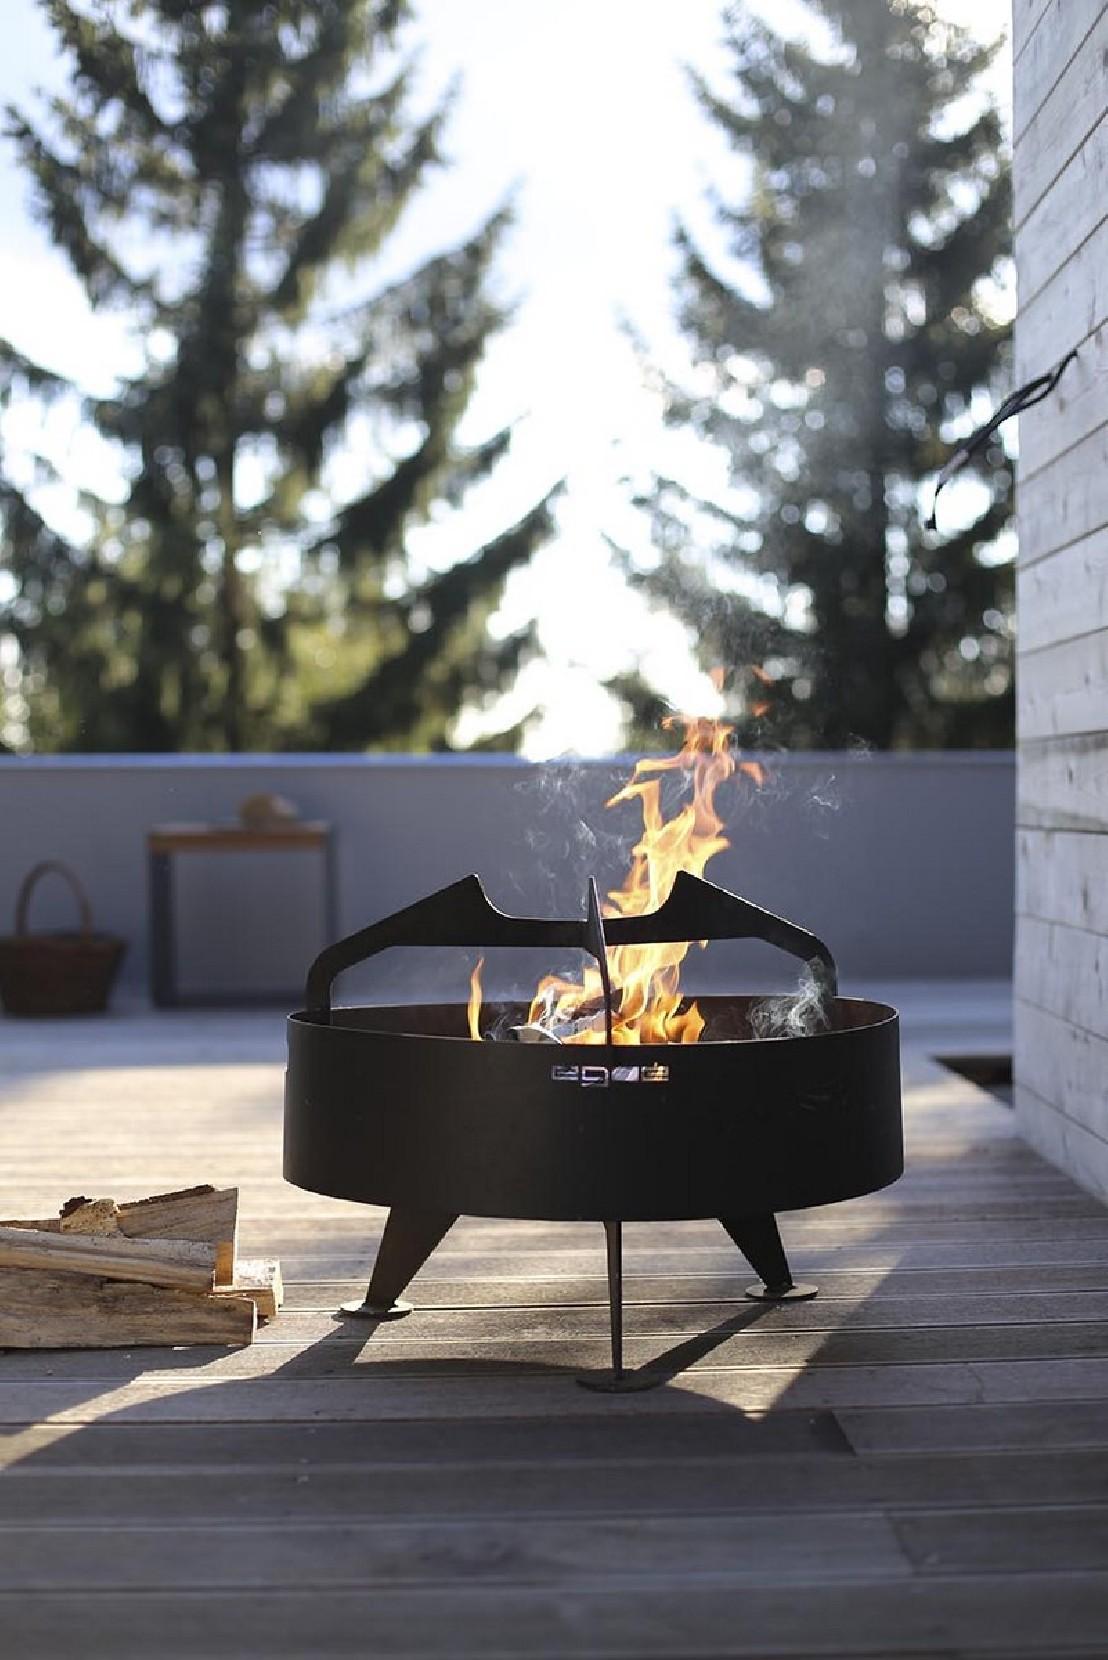 Brasero Grill Rond Back To Fire Pour Terrasse En Acier Inoxydable